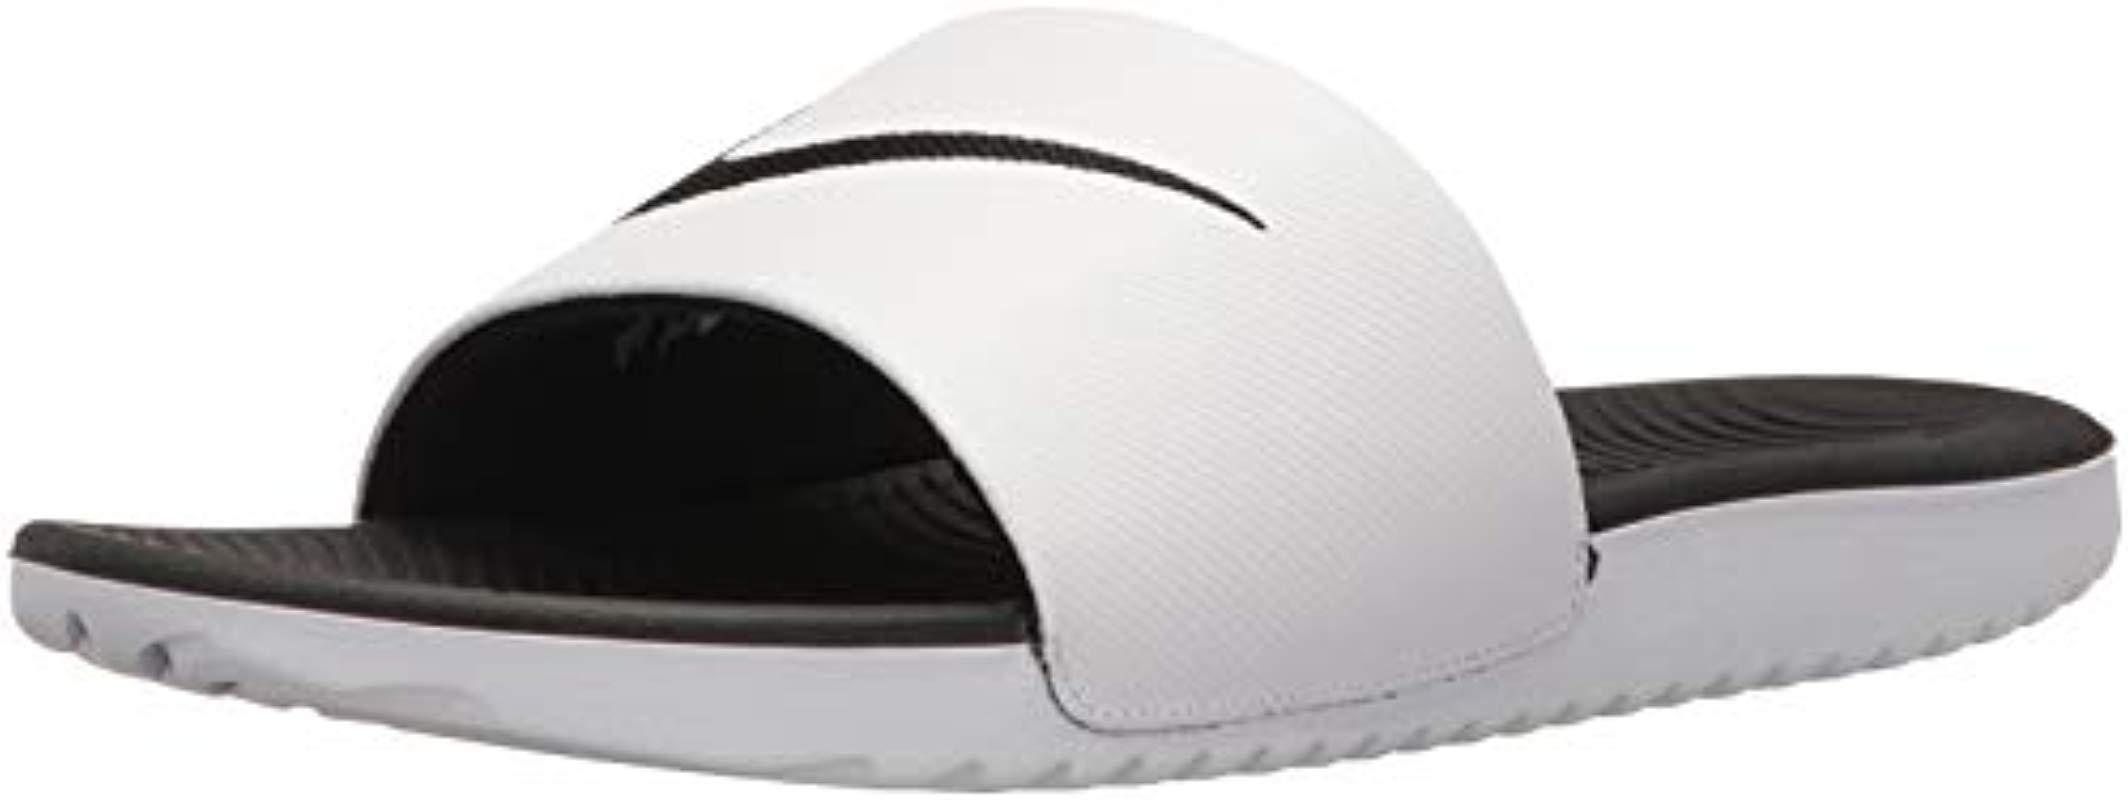 78621f9058e9 Nike Kawa Slide Low-top Sneakers in White for Men - Lyst